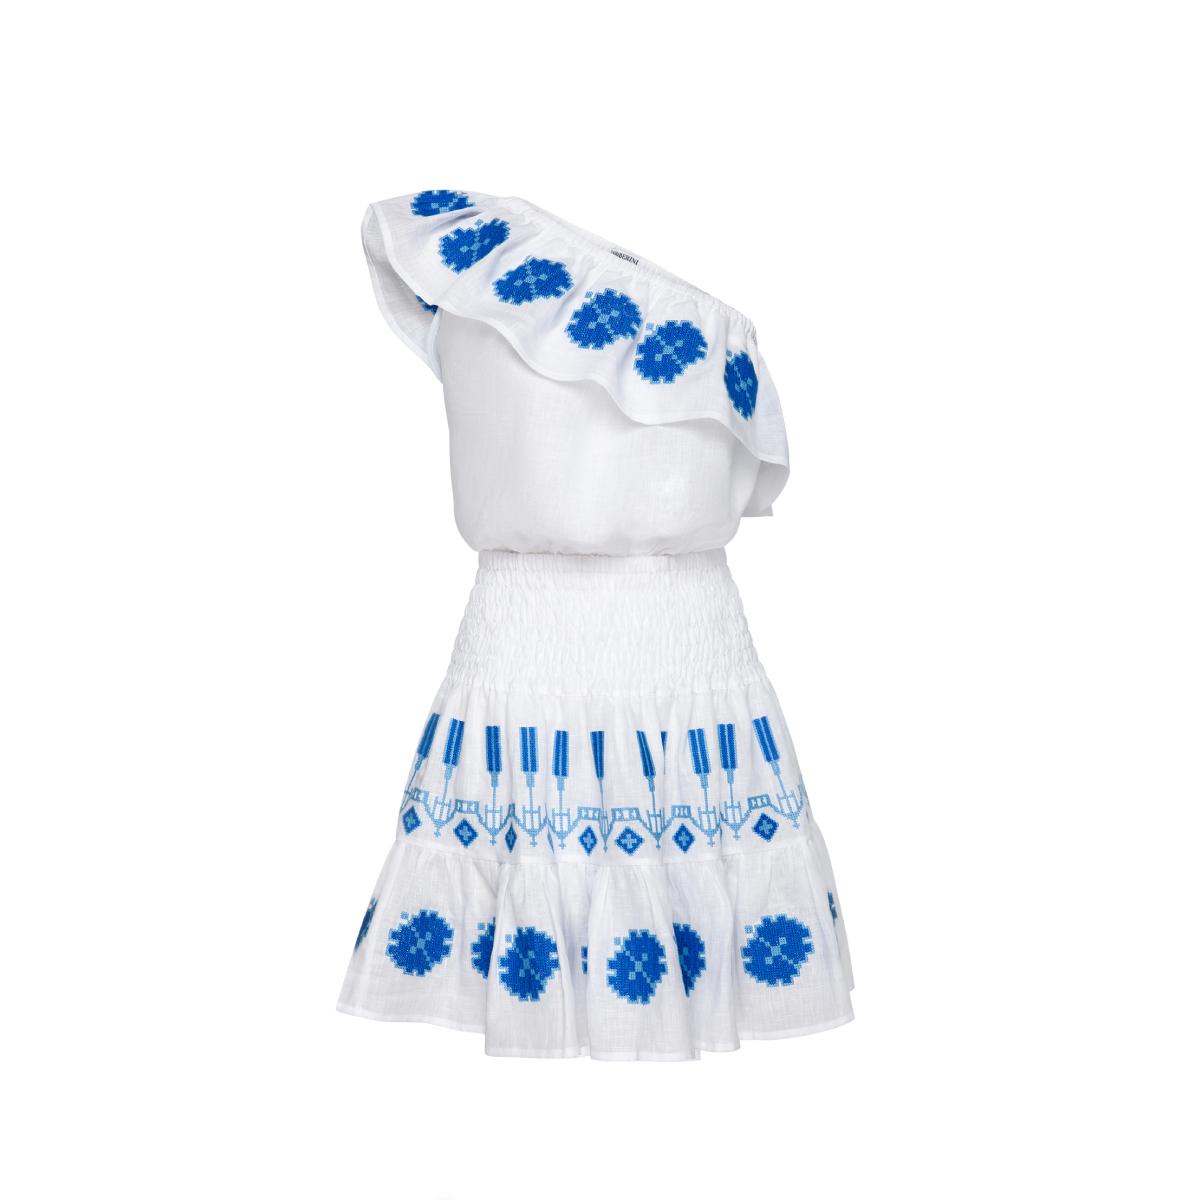 Periwinkle White Costume